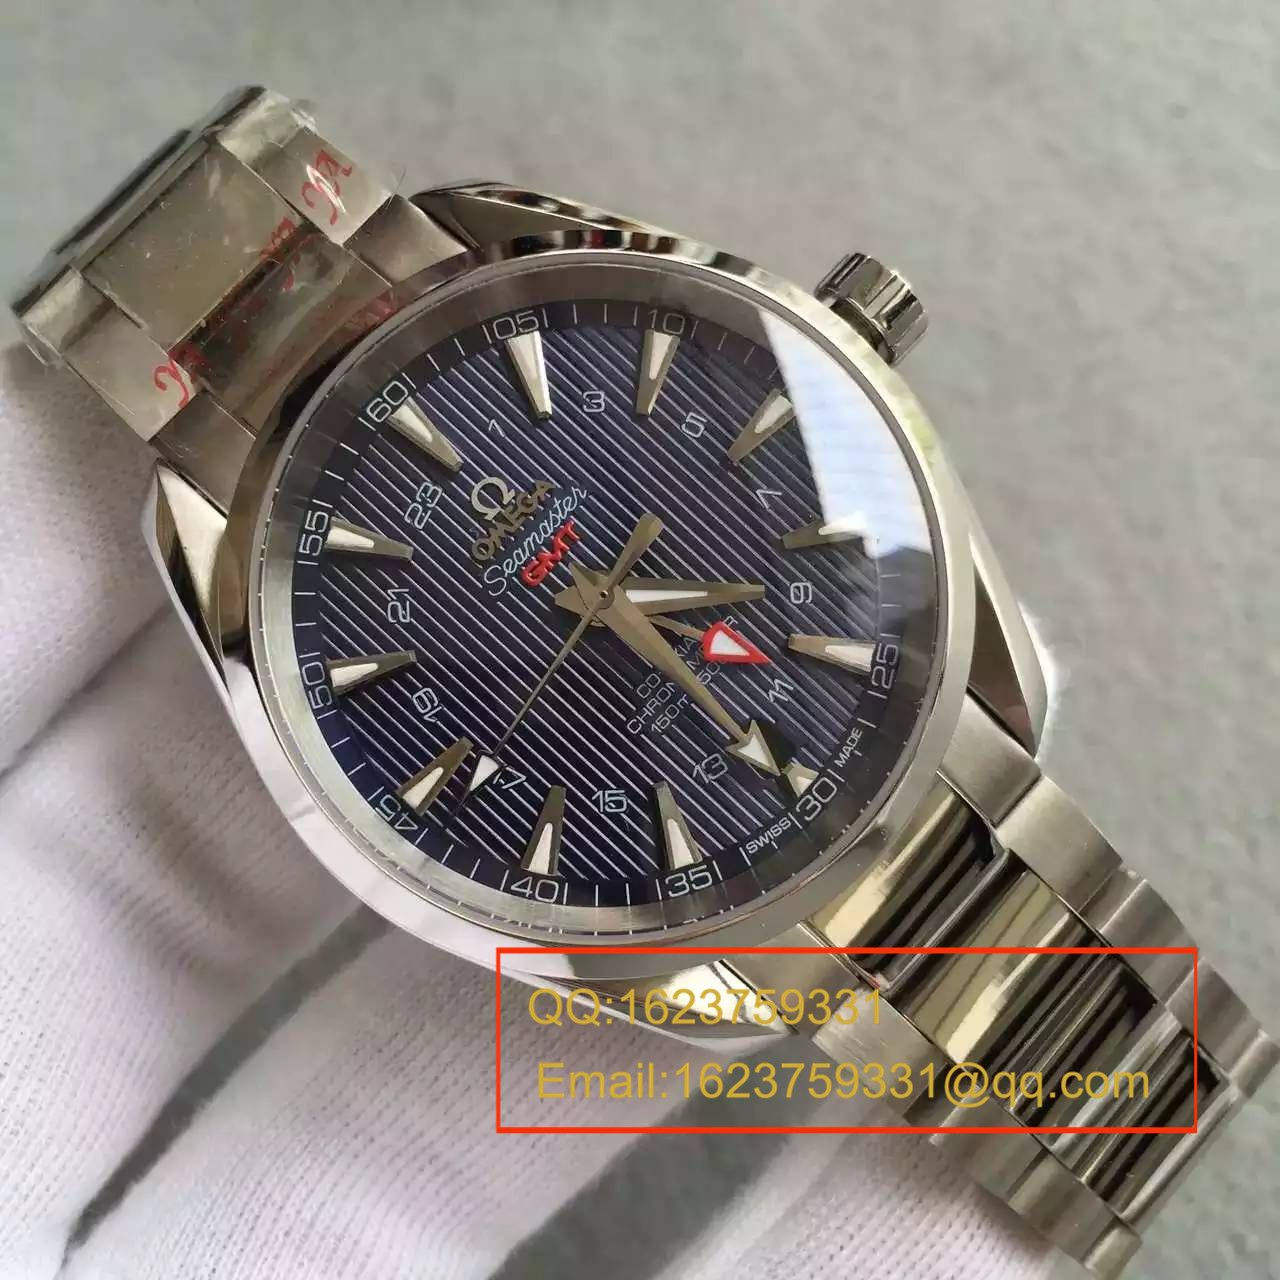 【KW厂完美版】欧米茄海马系列231.10.43.22.03.001 GMT双时区机械腕表